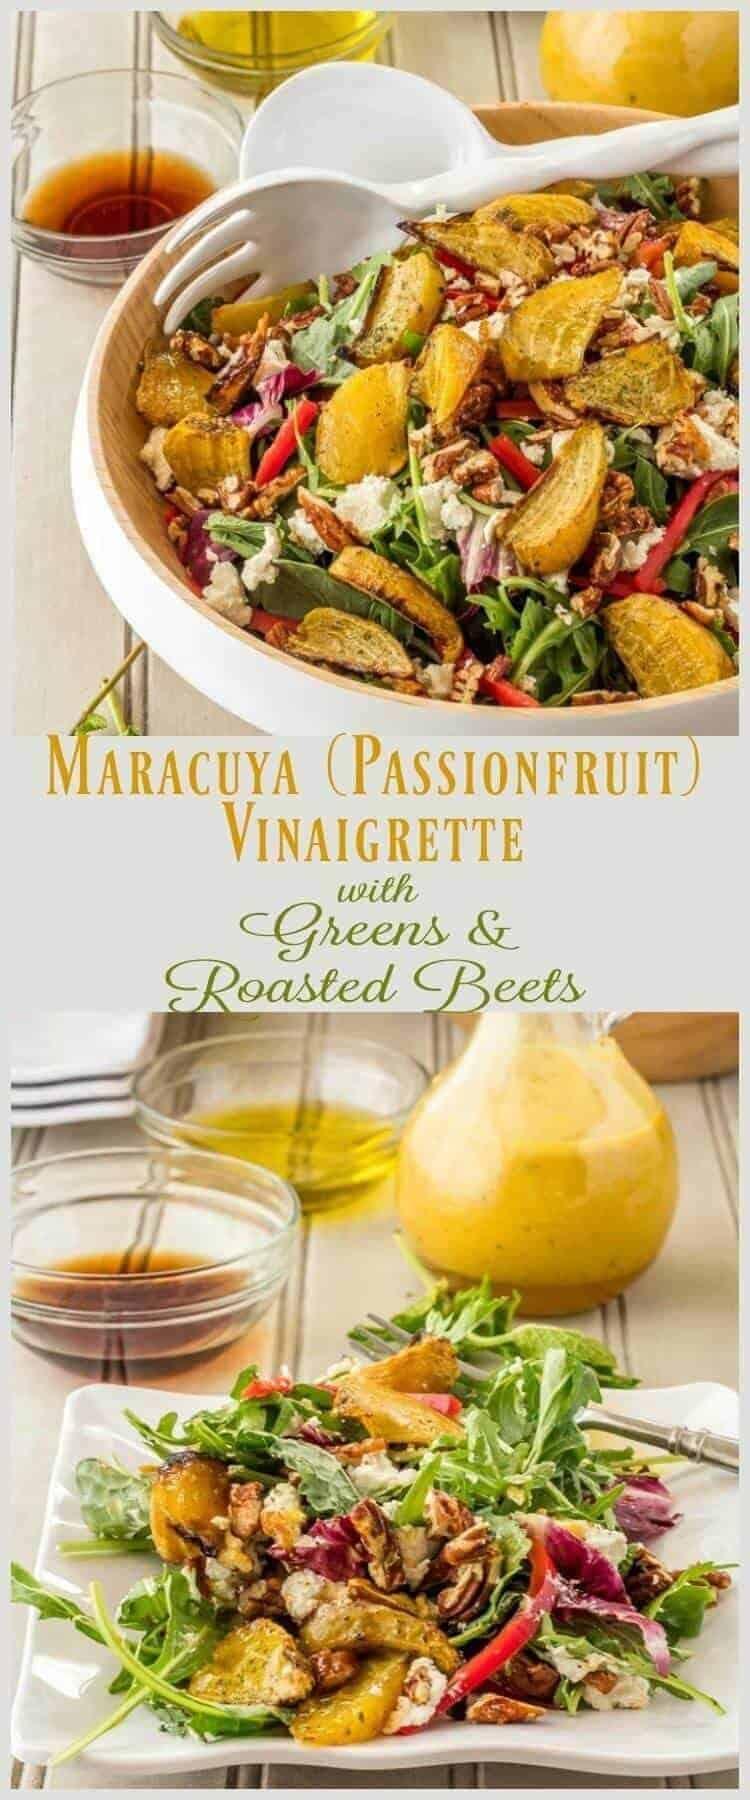 Maracuya (Passionfruit) Vinaigrette Pin